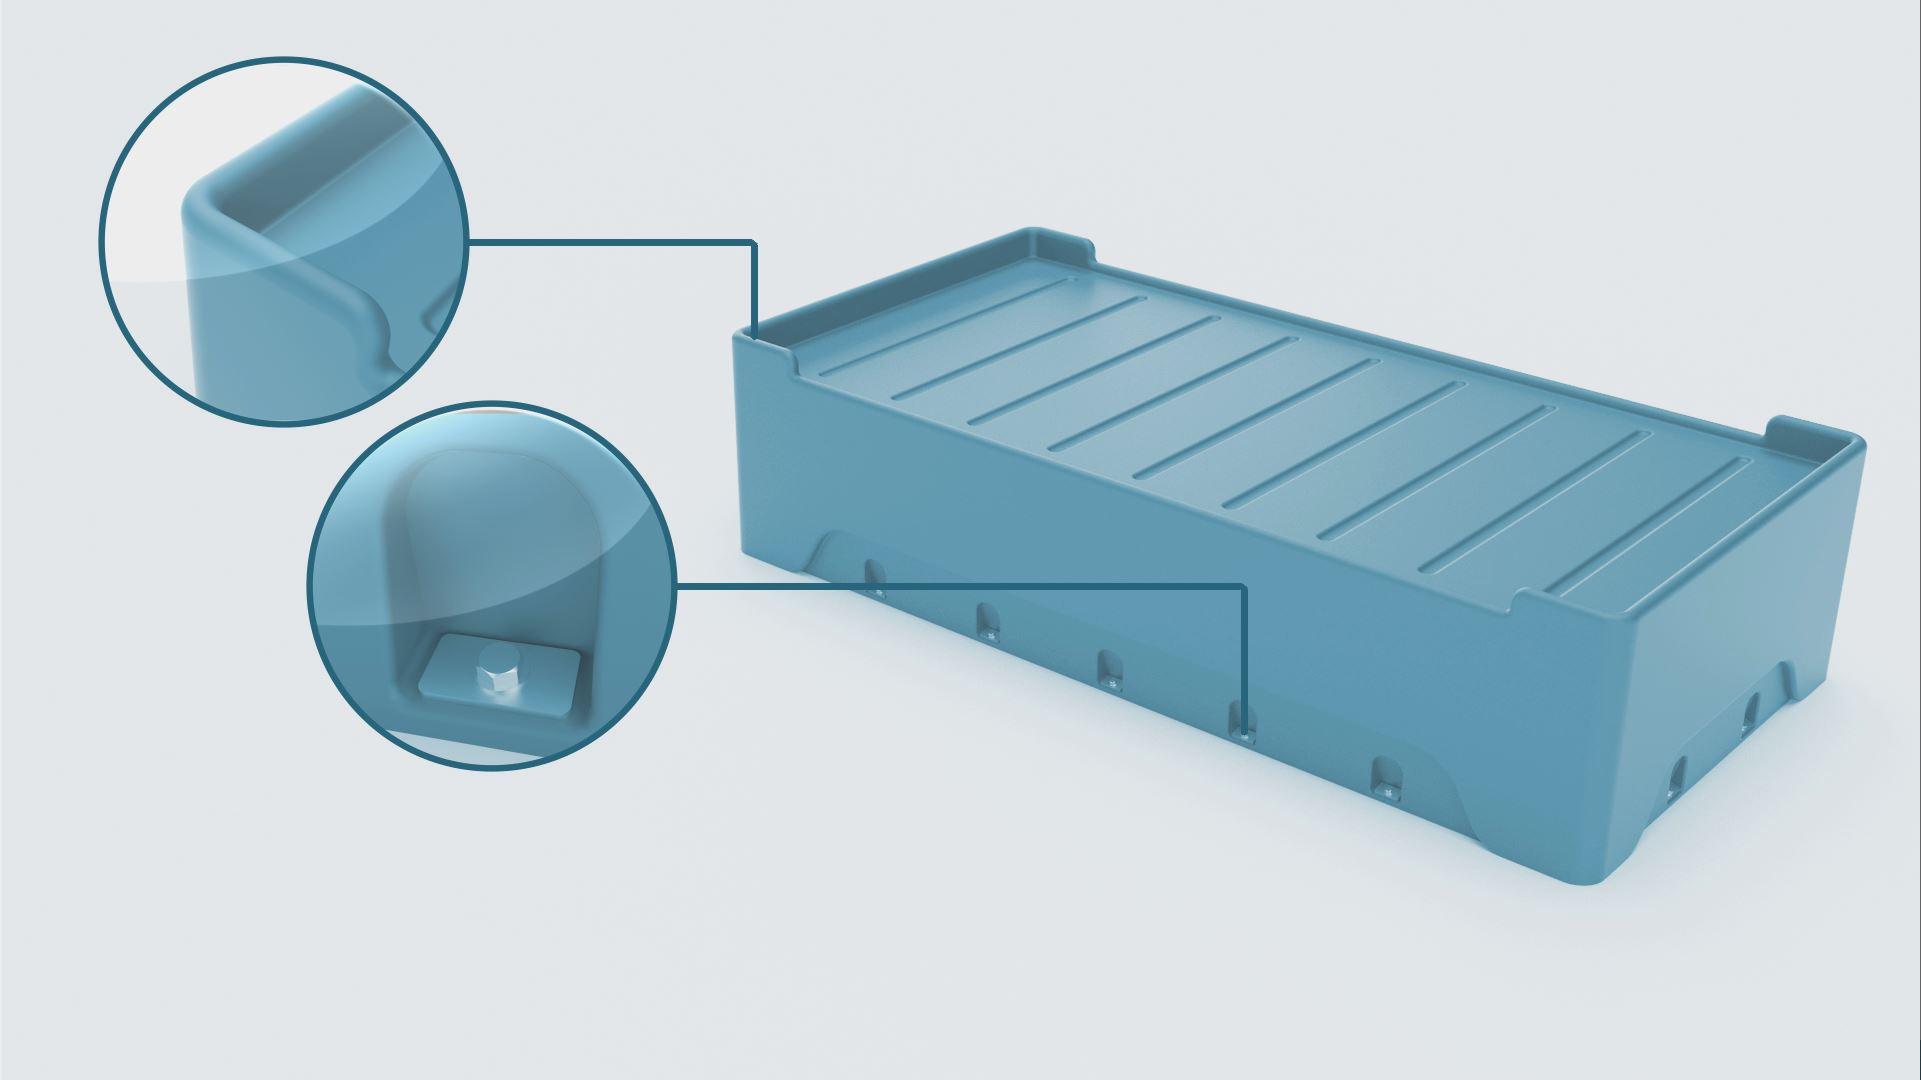 3D Rendering of Cranium Vacuum Modled bed base